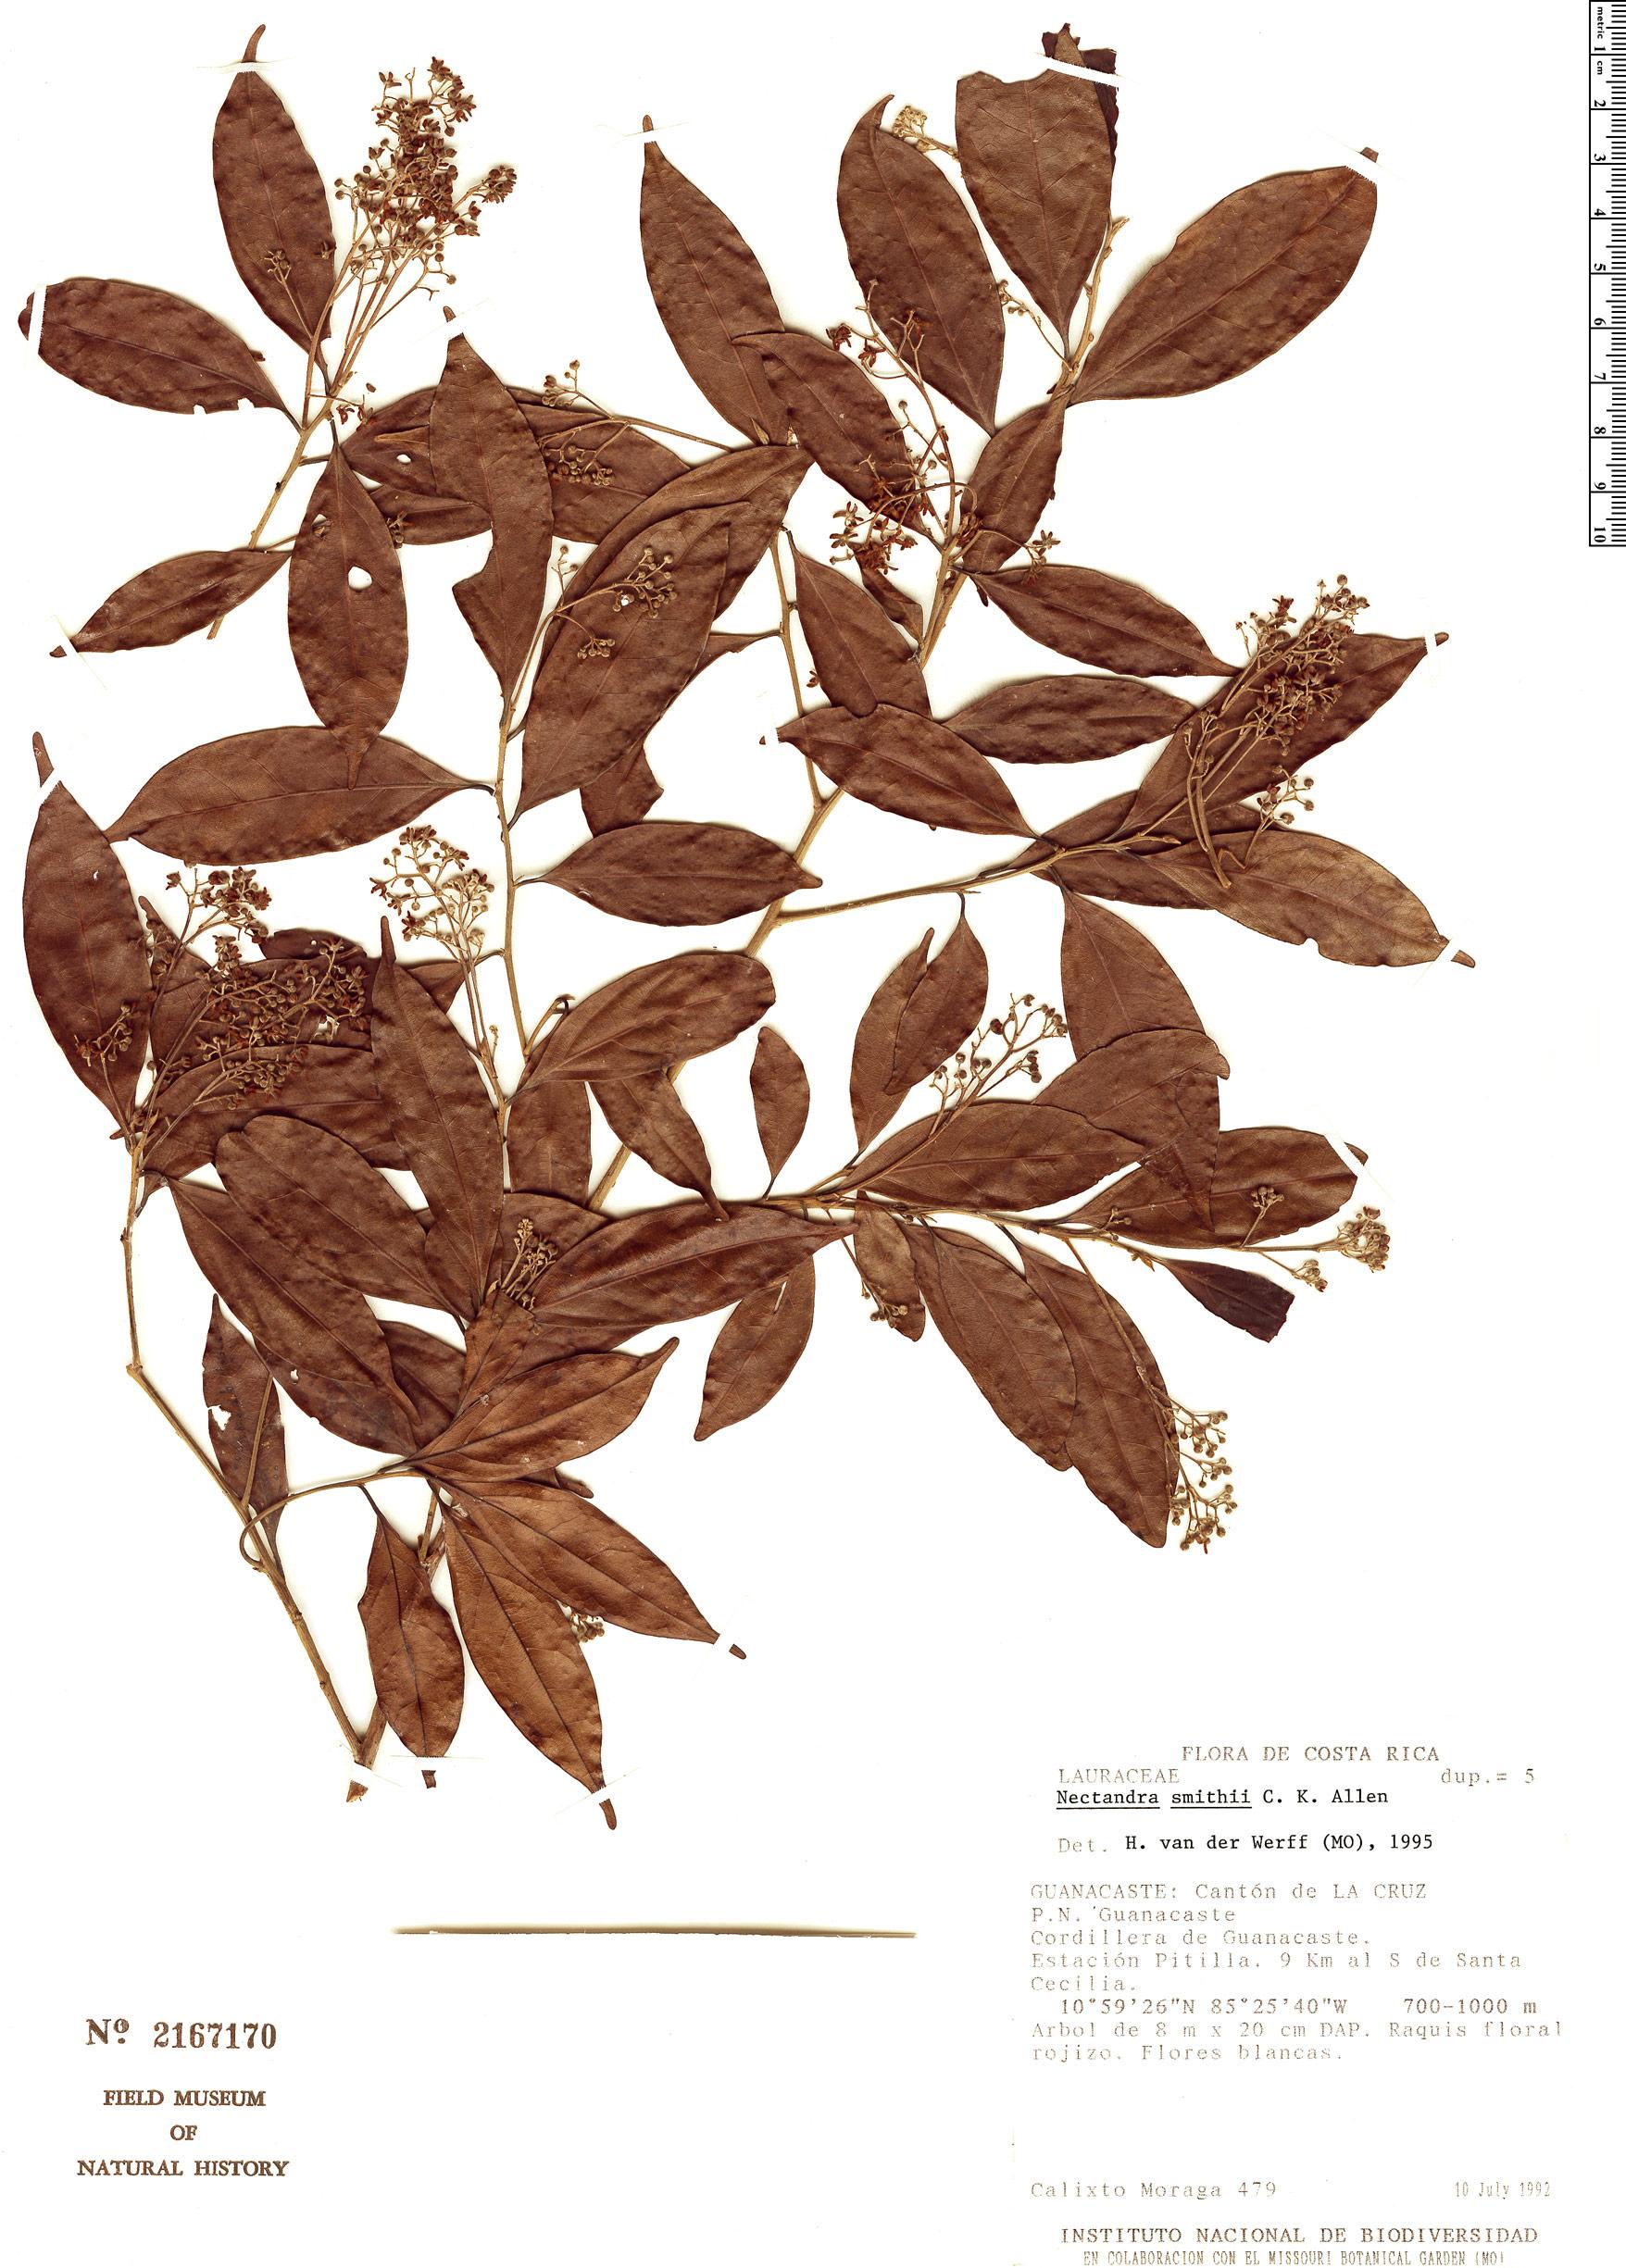 Specimen: Nectandra smithii